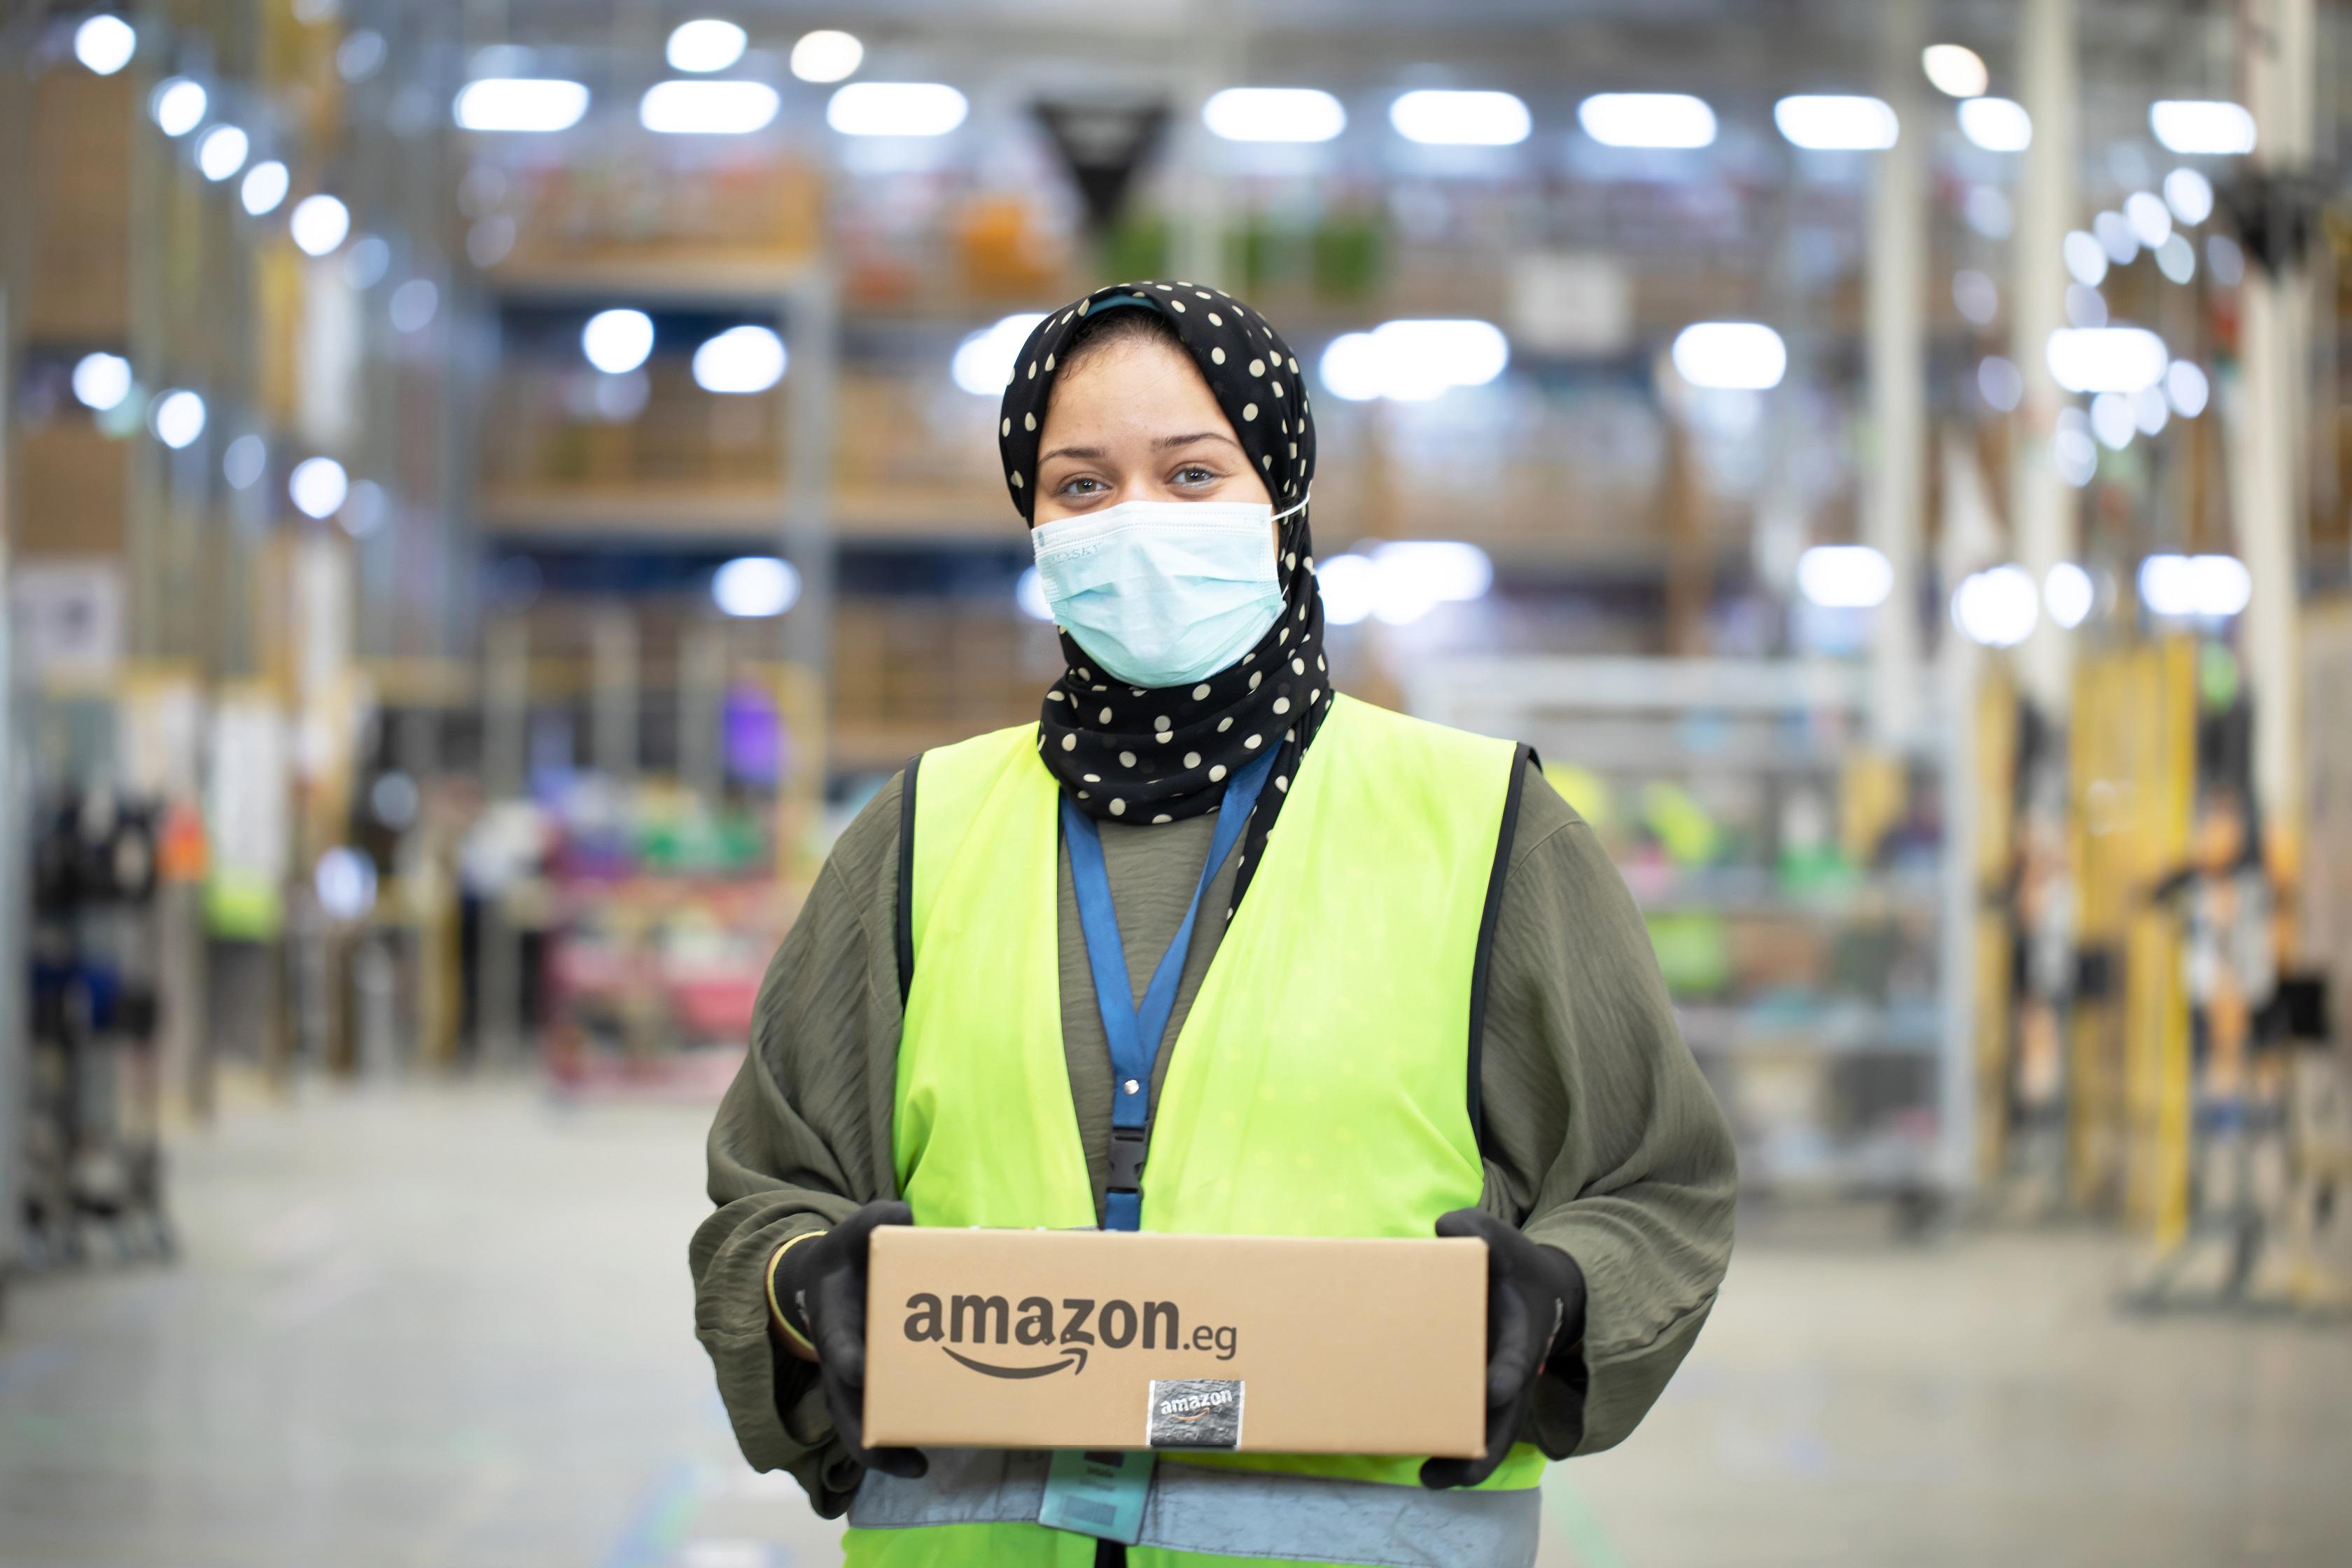 Amazon launches Amazon.eg in Egypt (4)